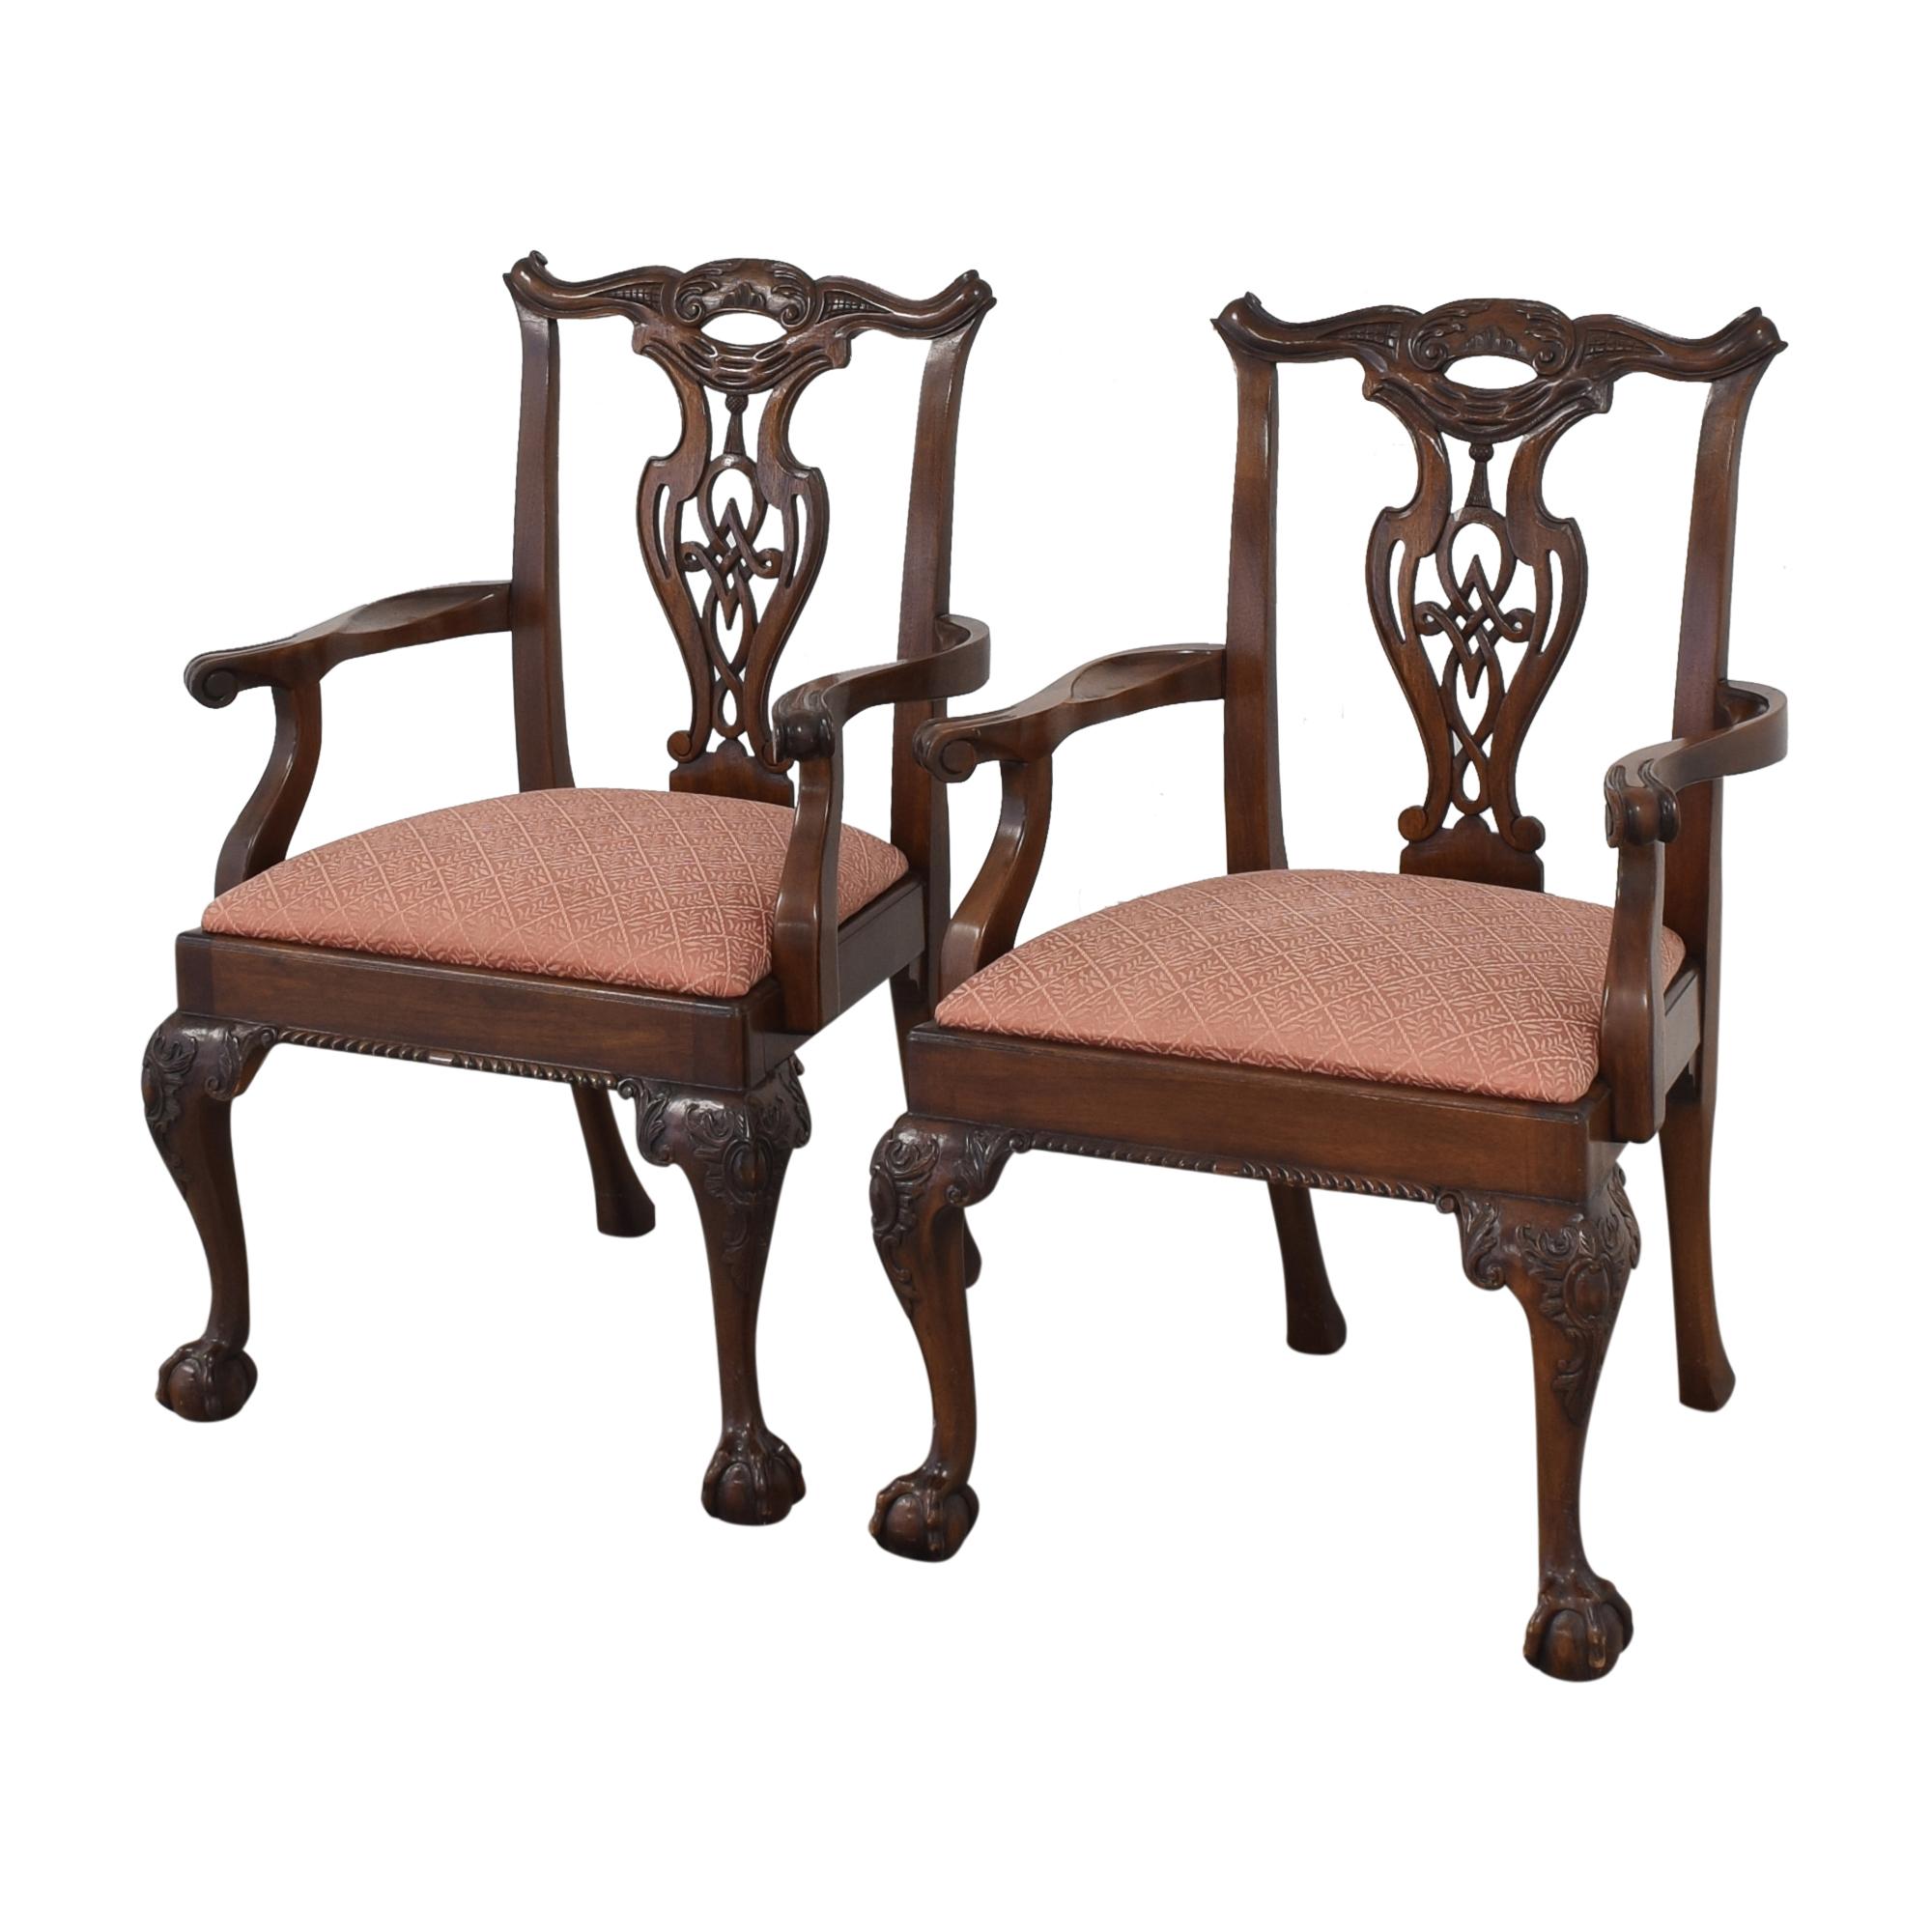 shop Henredon Heirloom Dining Chairs Henredon Furniture Dining Chairs